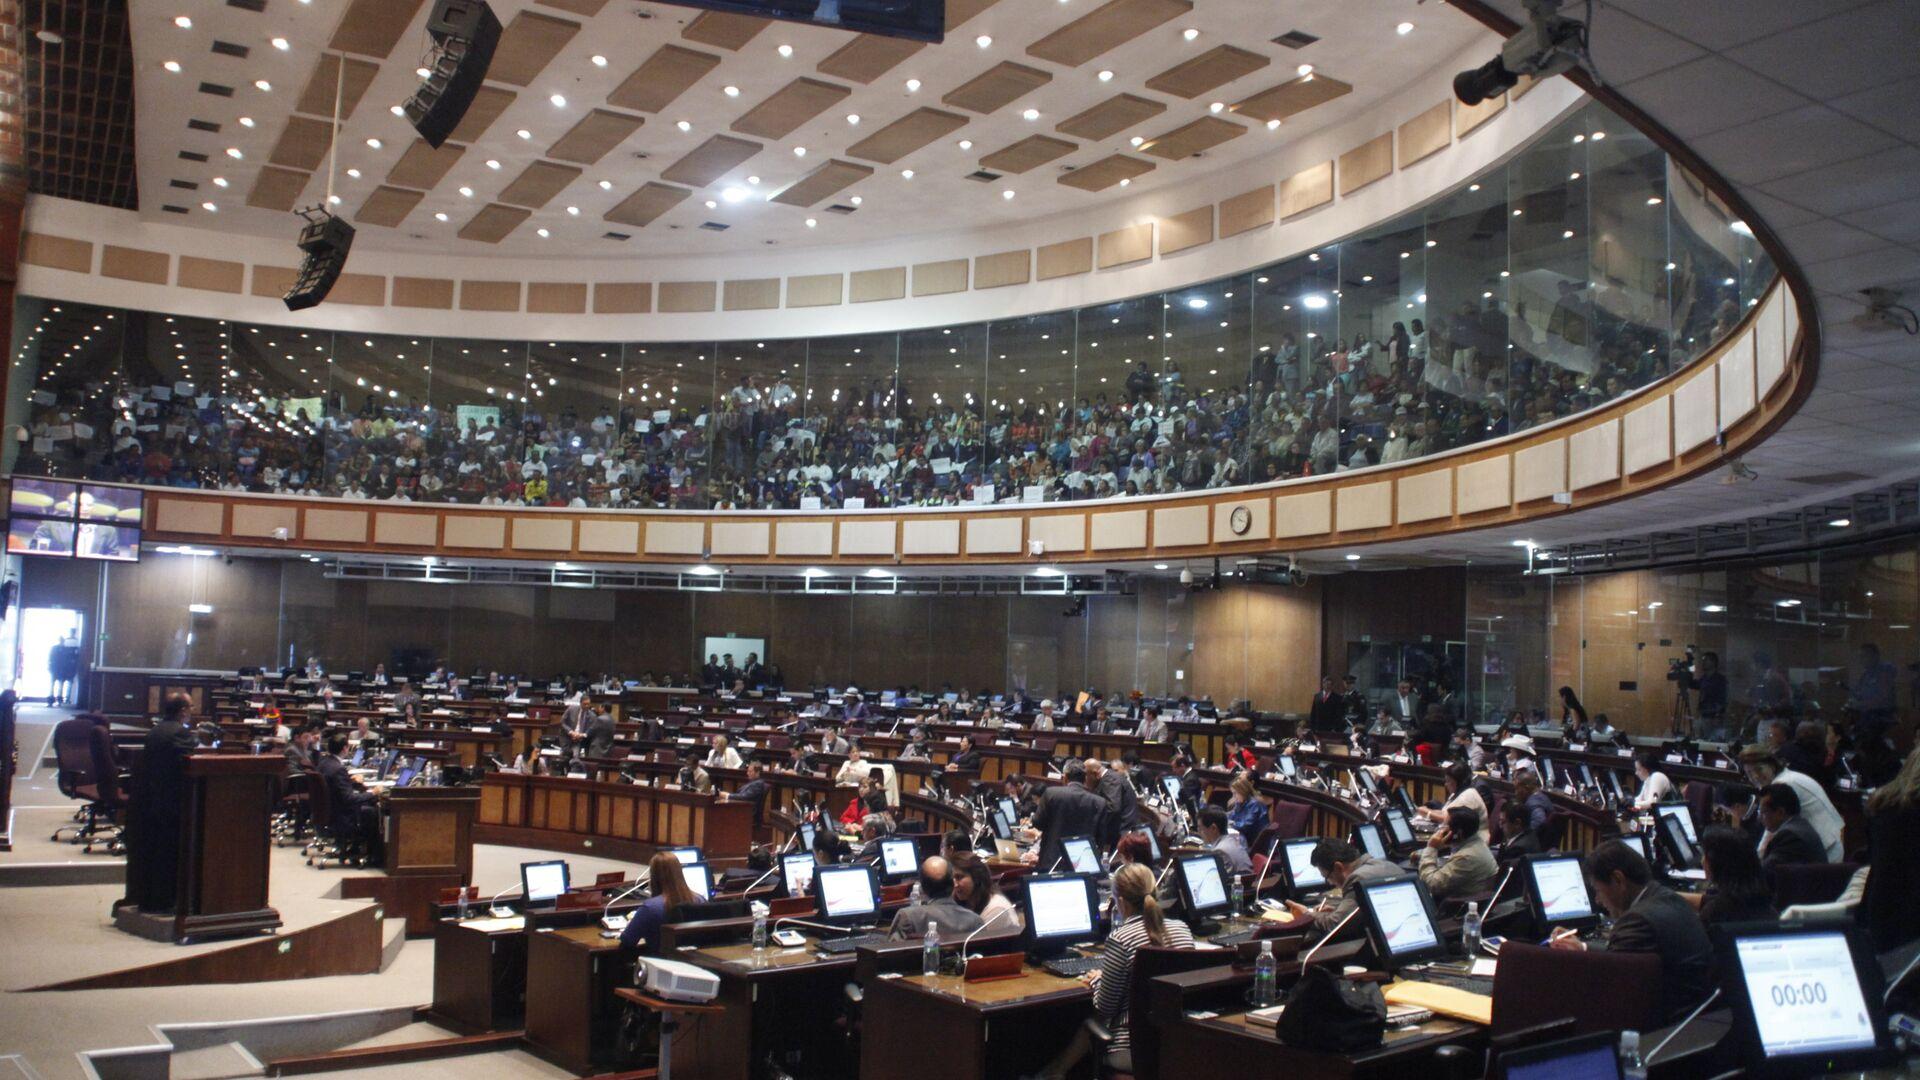 La Asamblea Nacional de Ecuador (archivo) - Sputnik Mundo, 1920, 23.04.2021